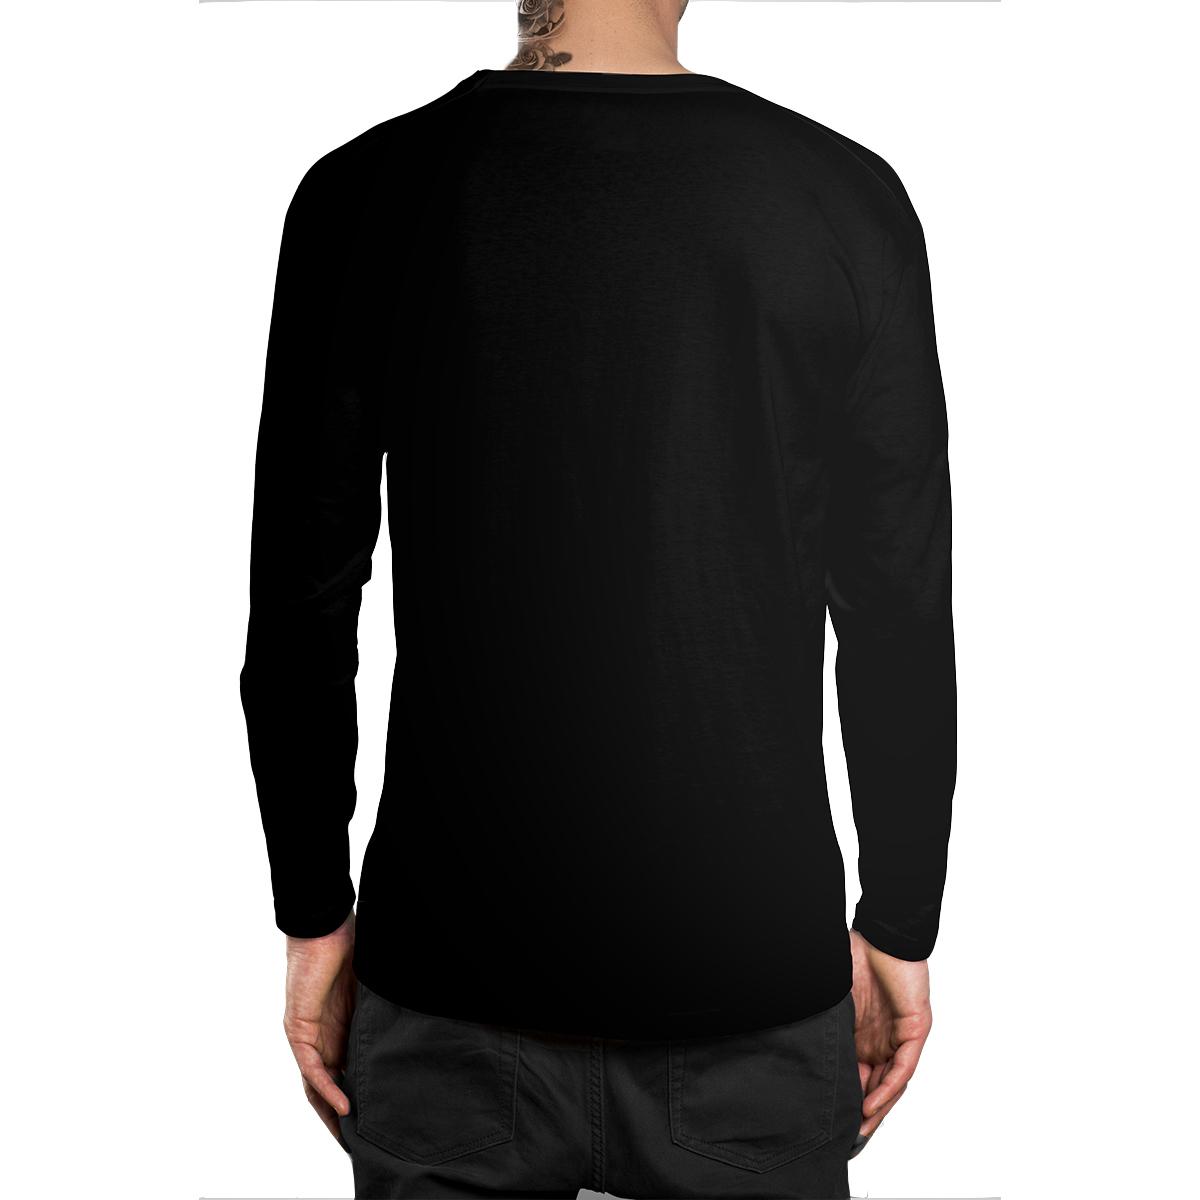 Stompy Camiseta Manga Longa Modelo 43